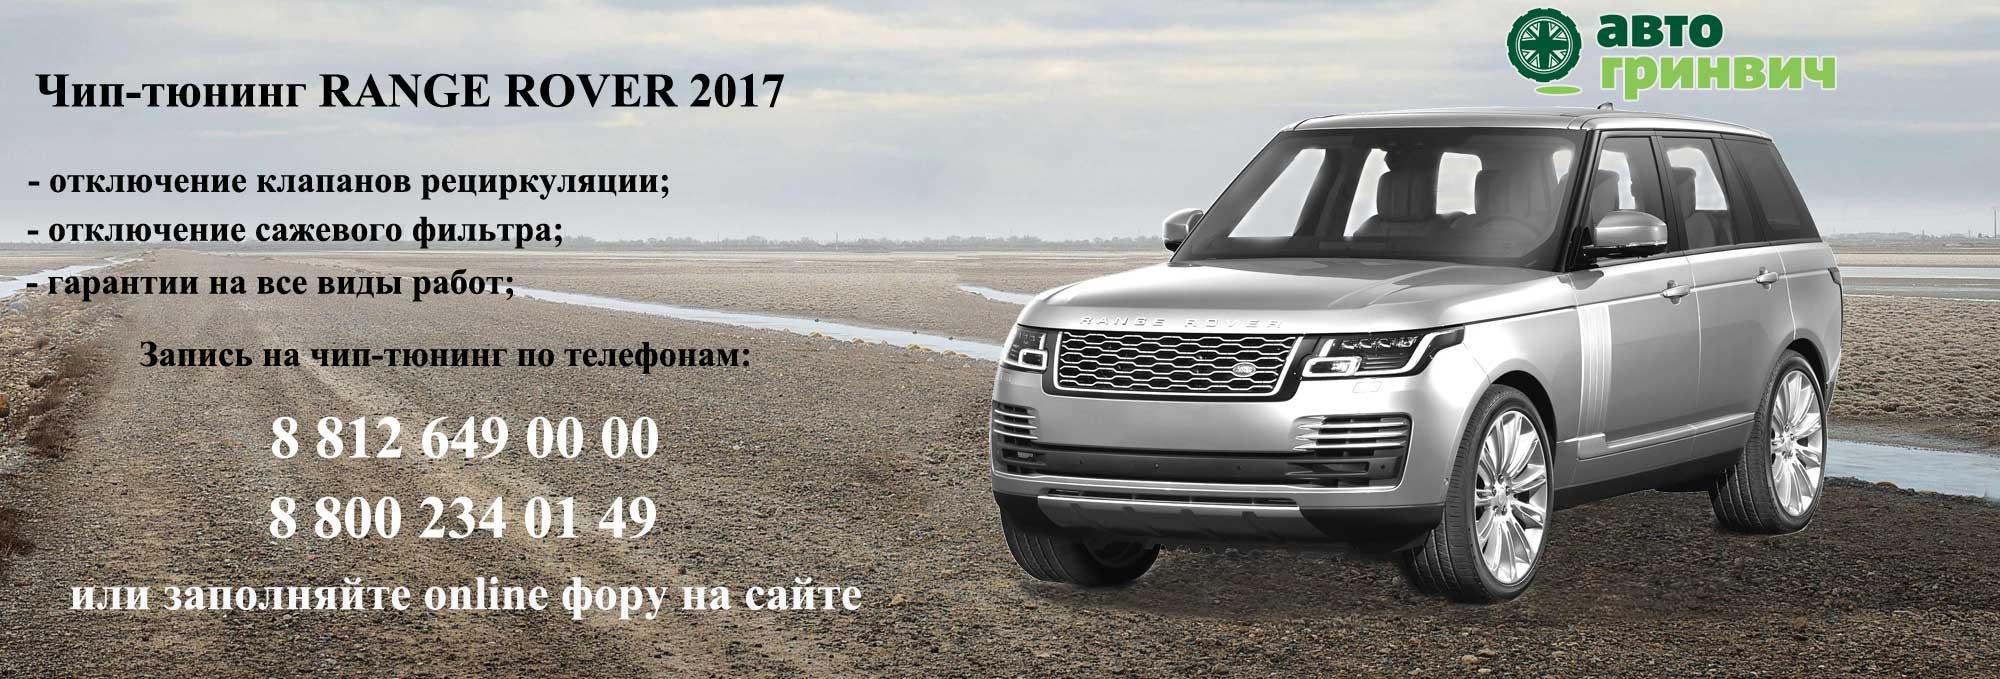 Чип-тюнинг Range Rover 2017